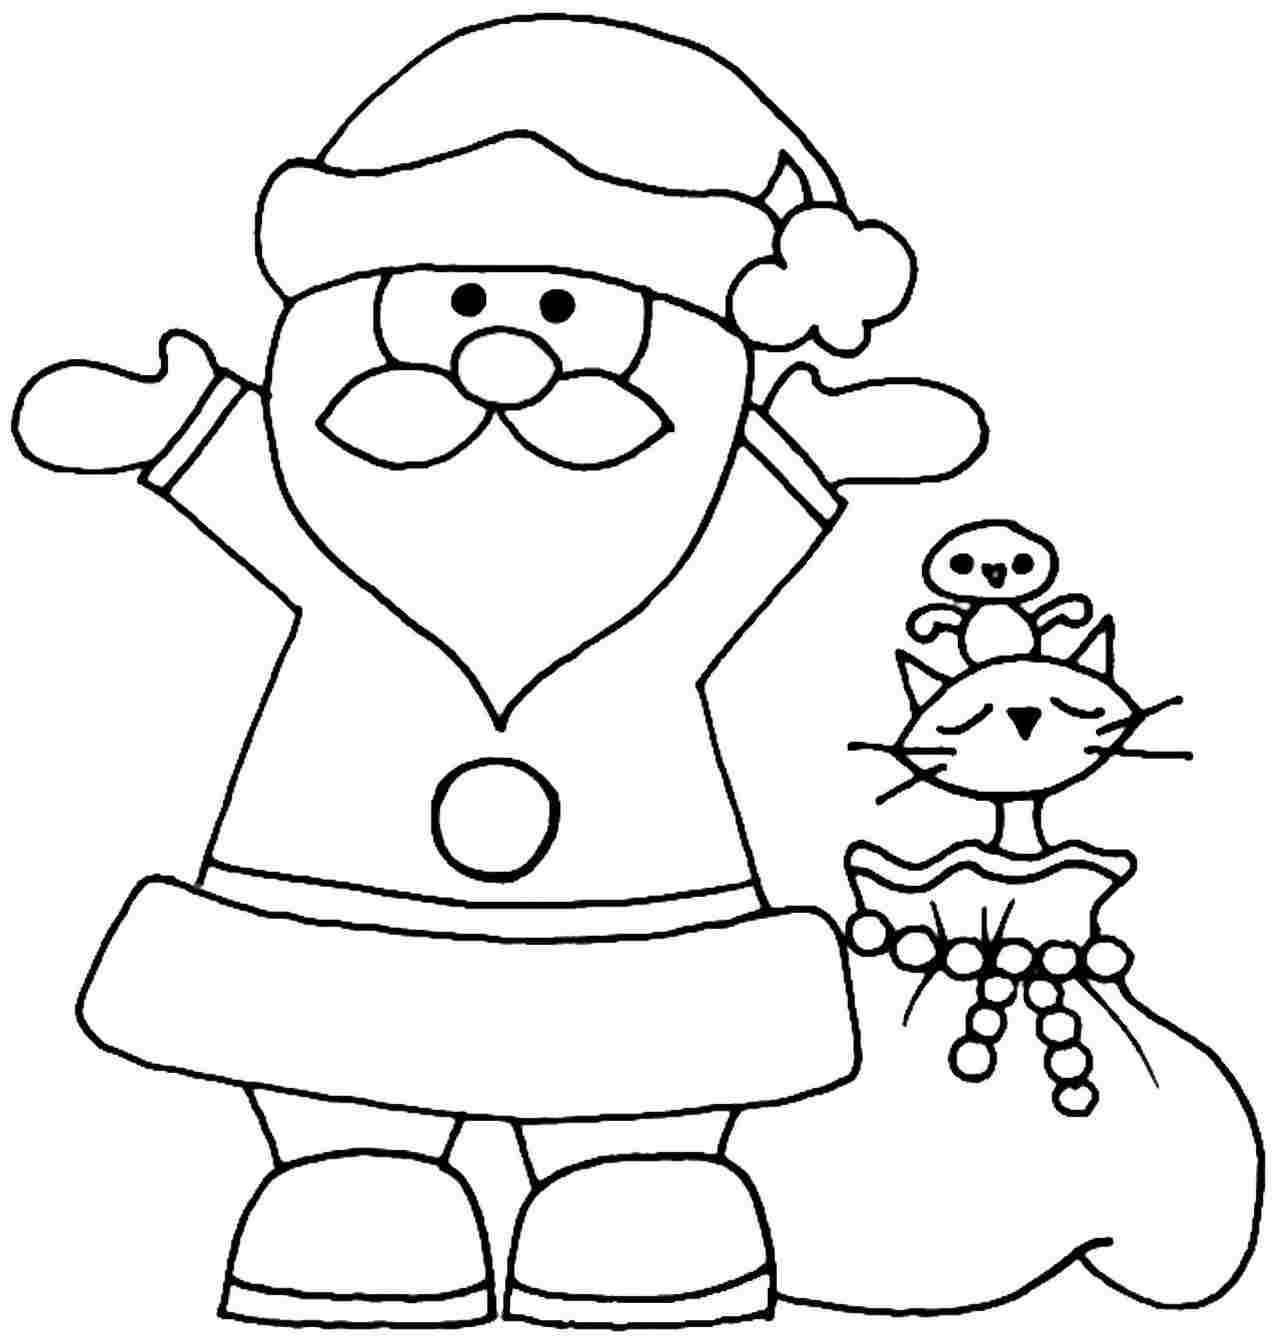 Santa Claus Coloring Pages Image Picture Photo Wallpaper 09